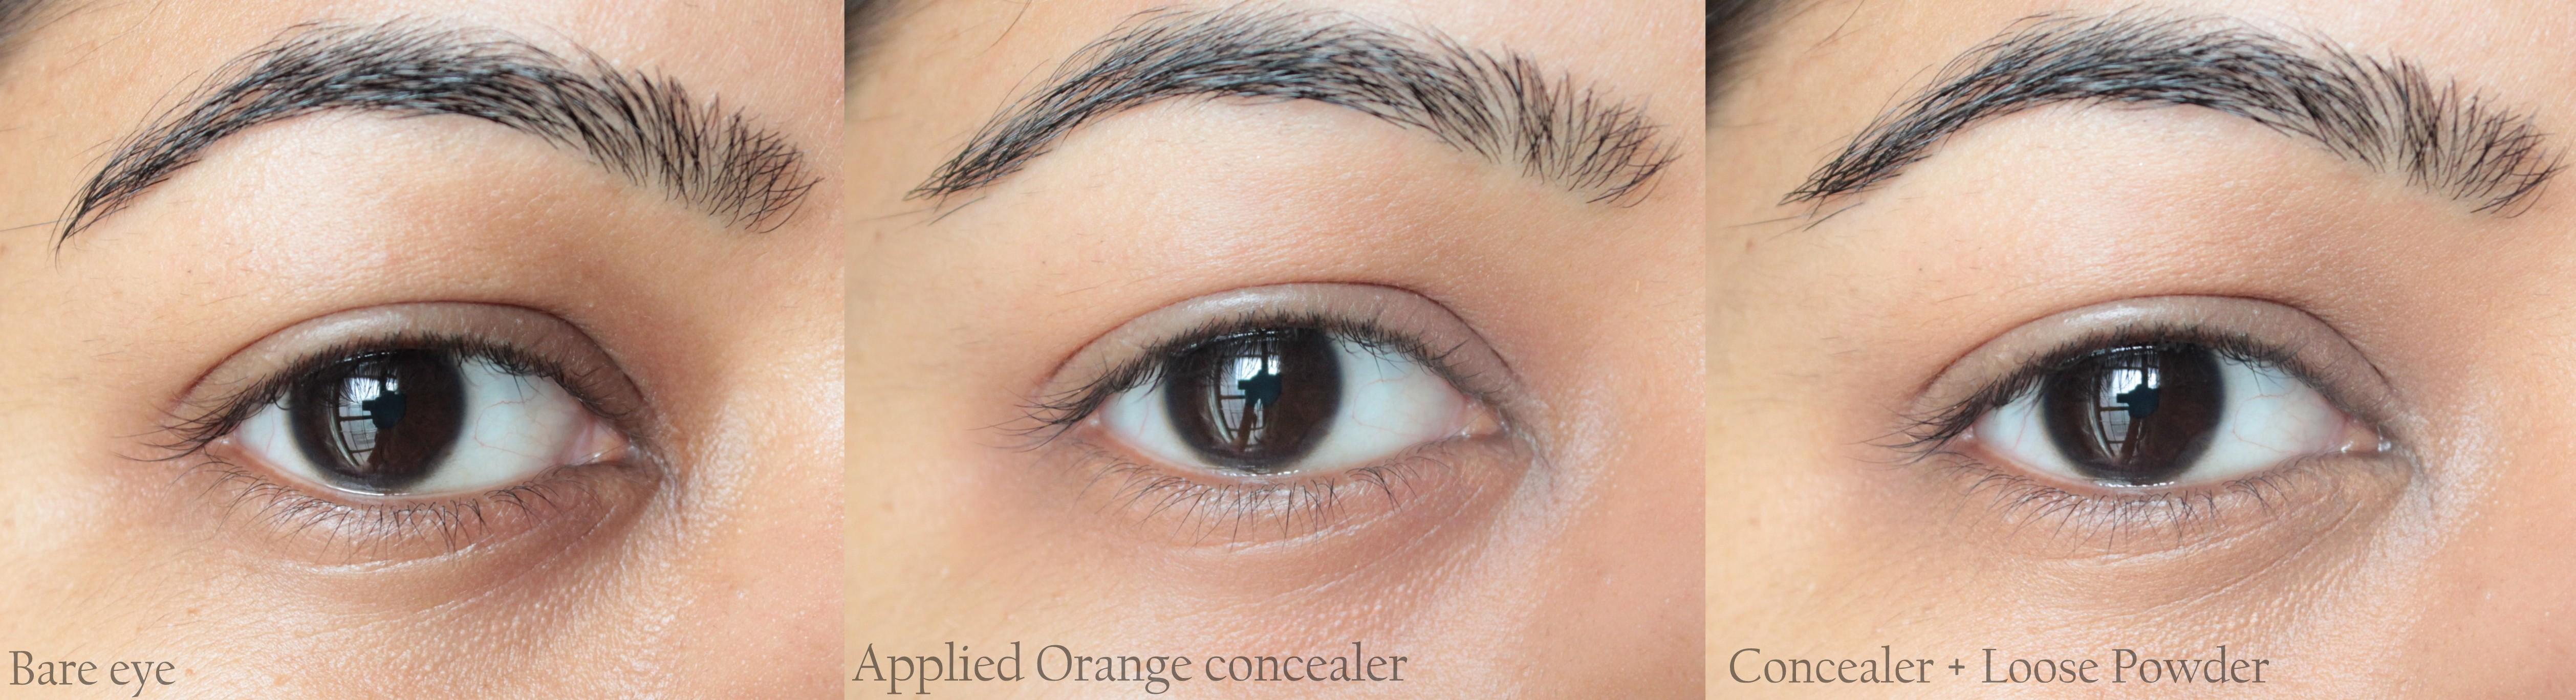 Clinique even better makeup foundation review swatches before - Clinique Even Better Concealer Orange Brightener Clinique Orange Brightener